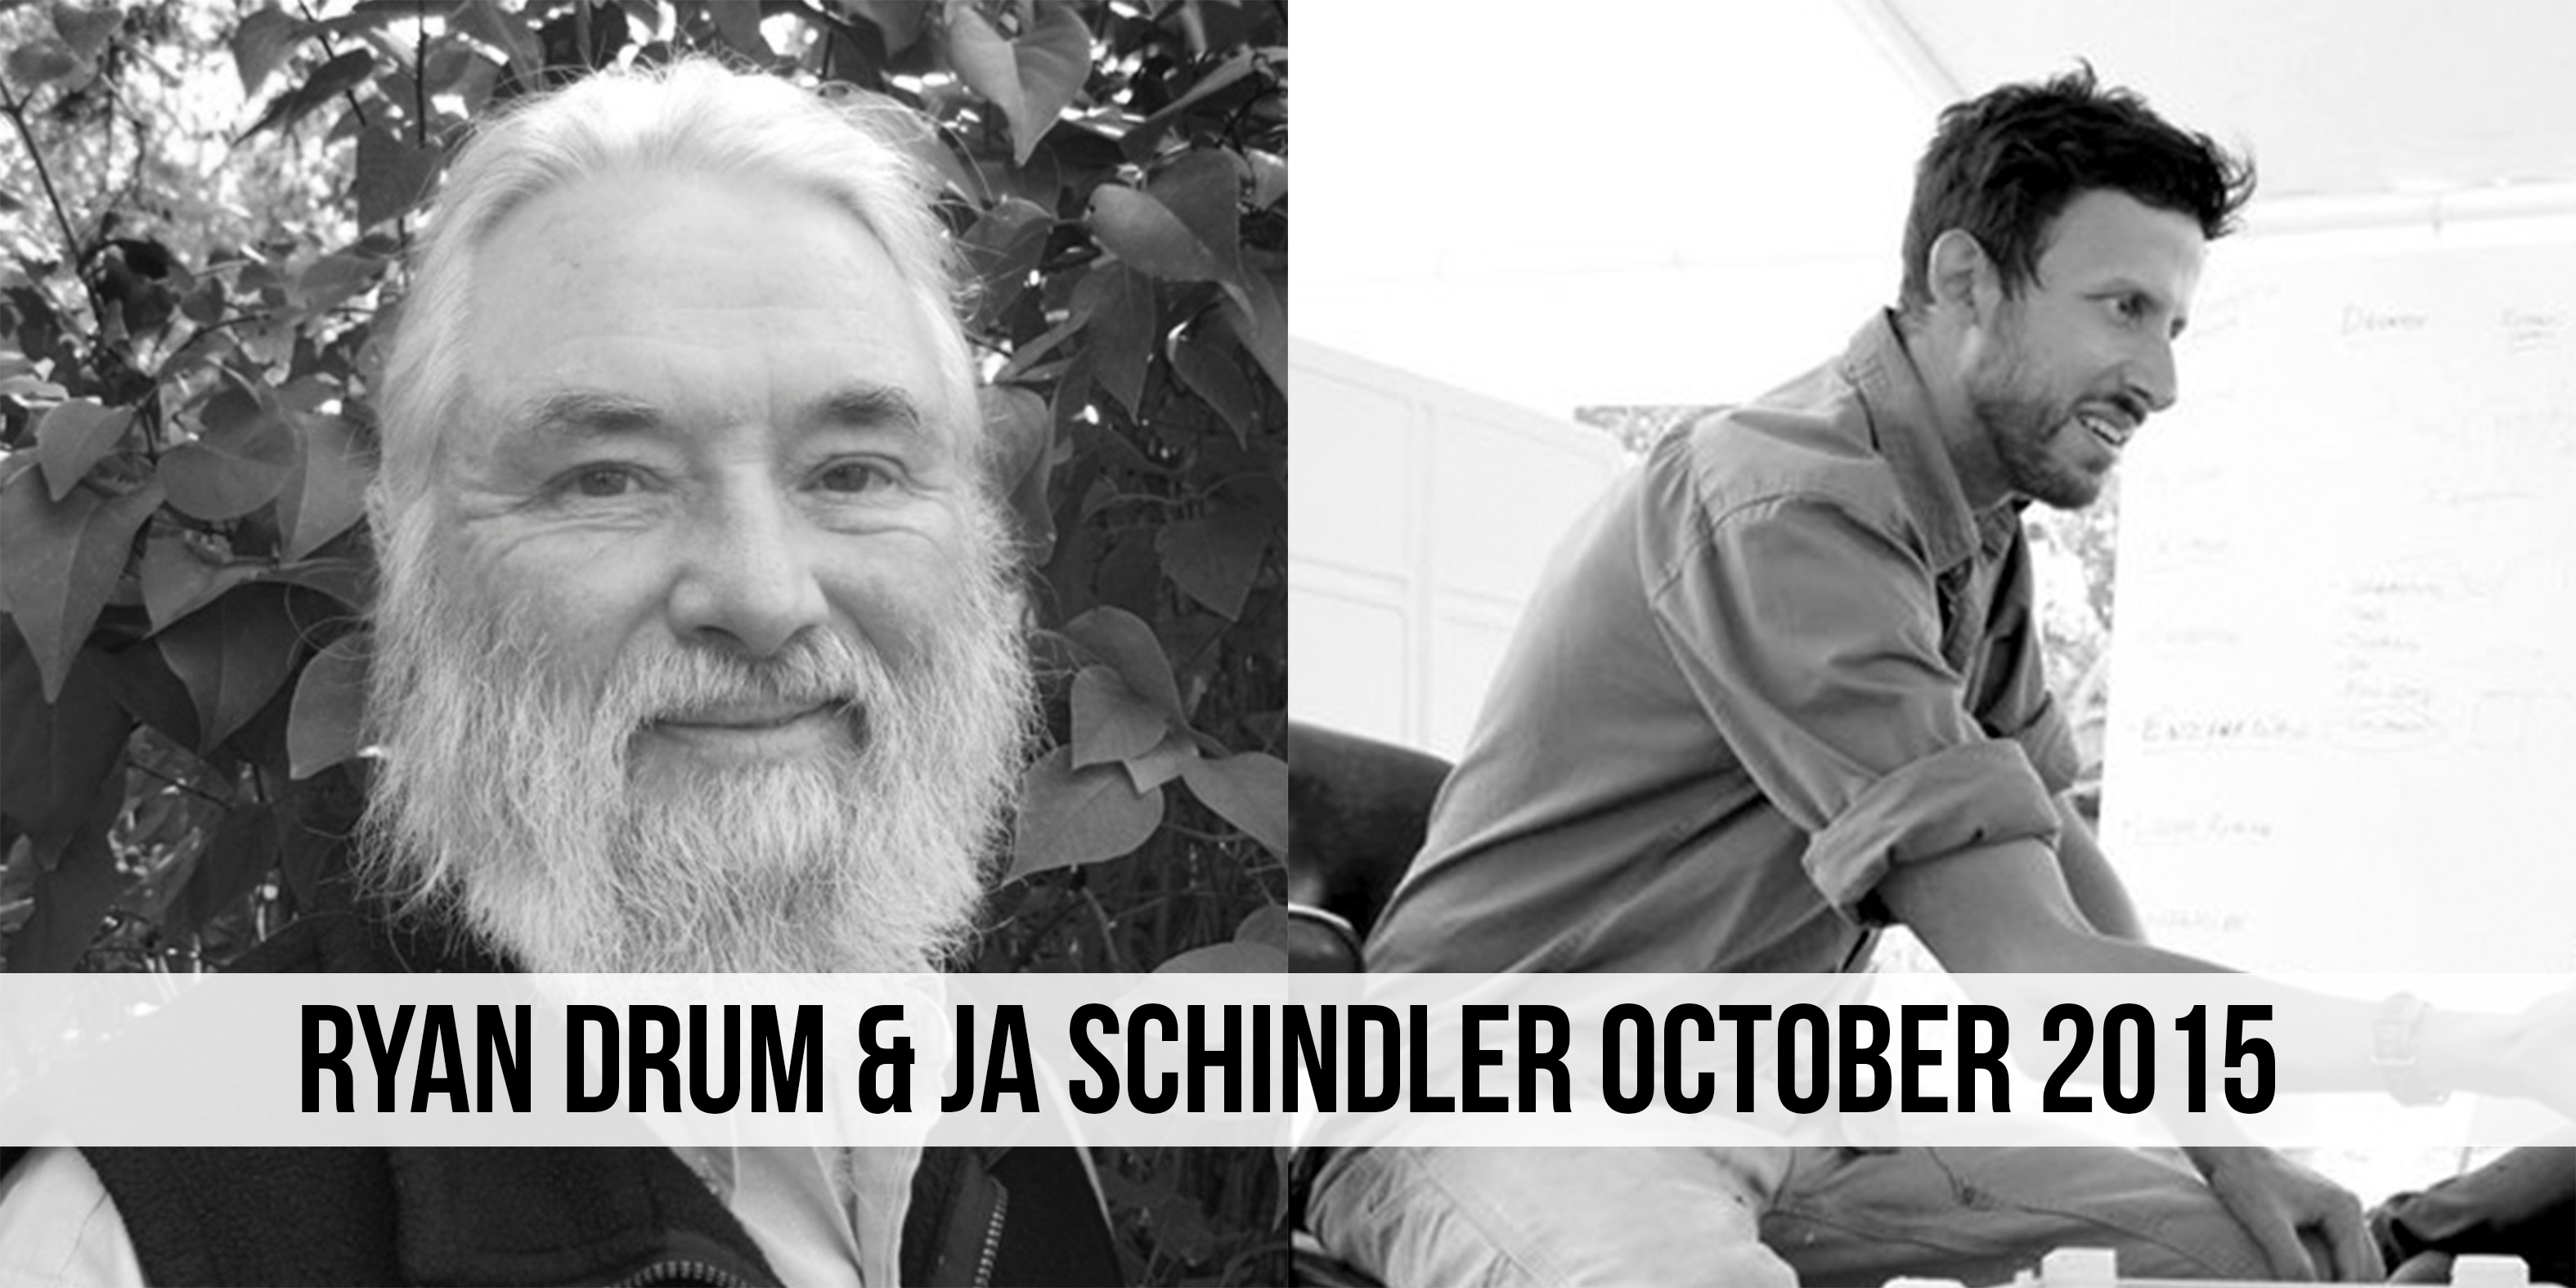 Ryan Drum and Ja Schindler